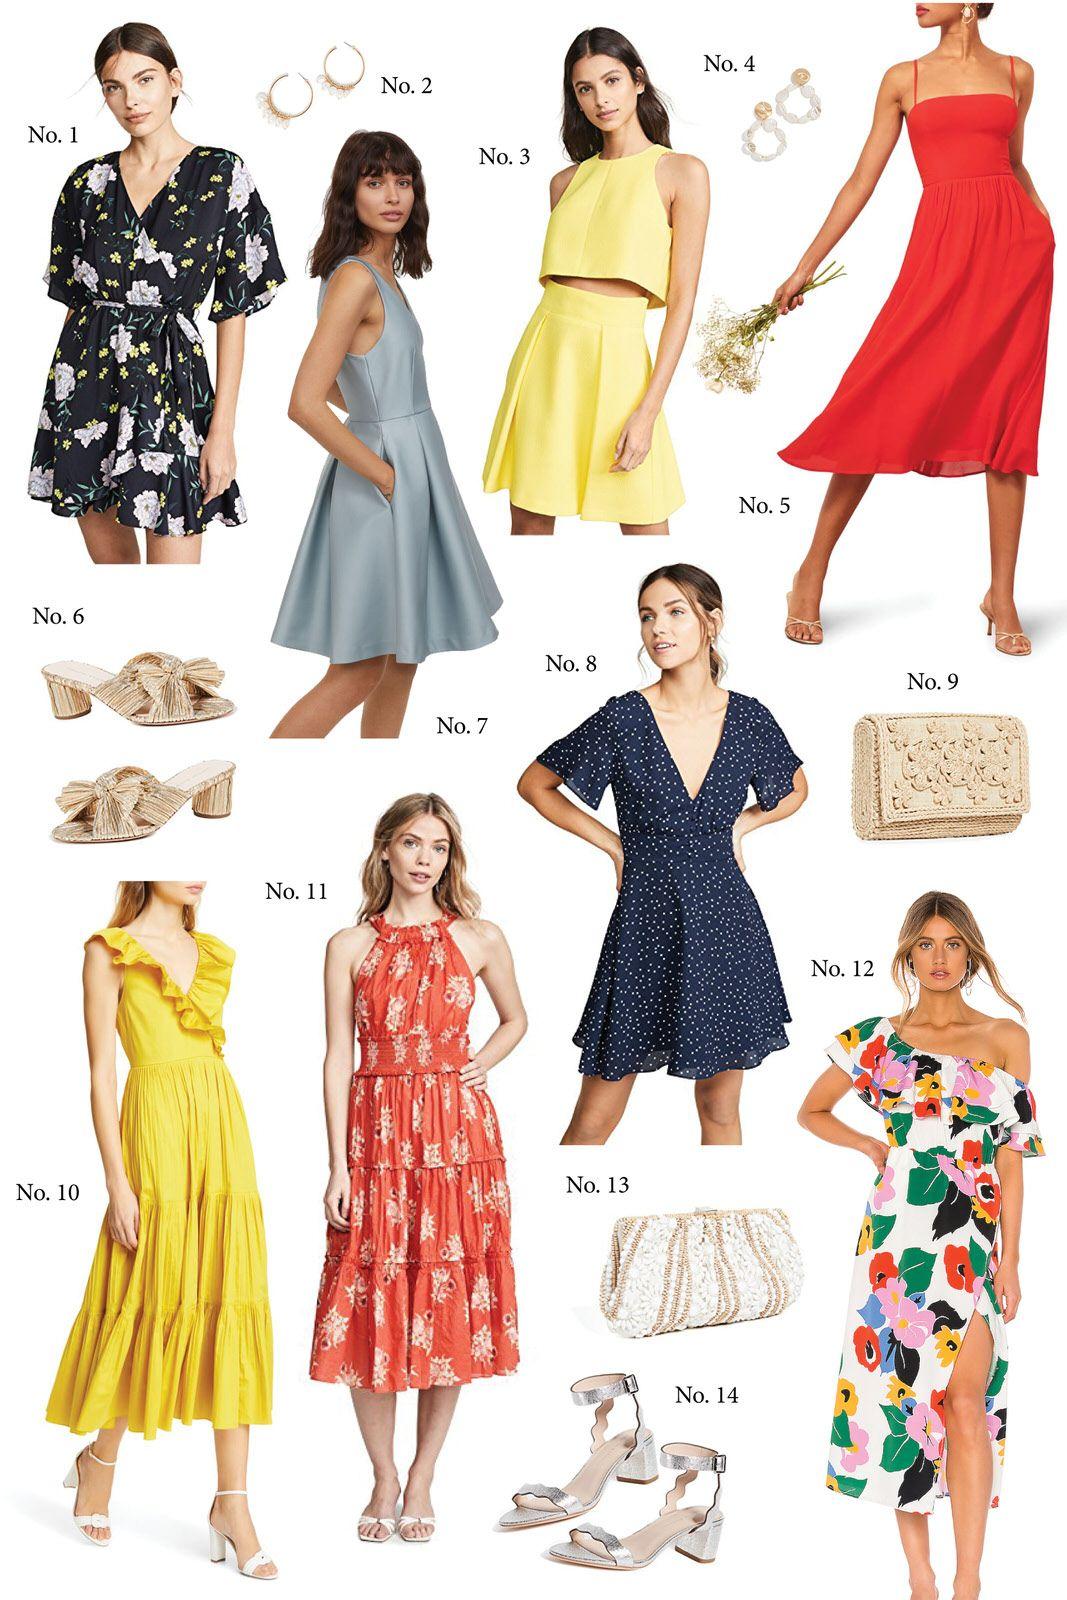 Wedding Guest Dress Ideas For Every Event On Your Calendar This Season Hello Adams Fa Wedding Guest Dress Summer Wedding Guest Dress Fall Wedding Guest Dress [ 1600 x 1067 Pixel ]